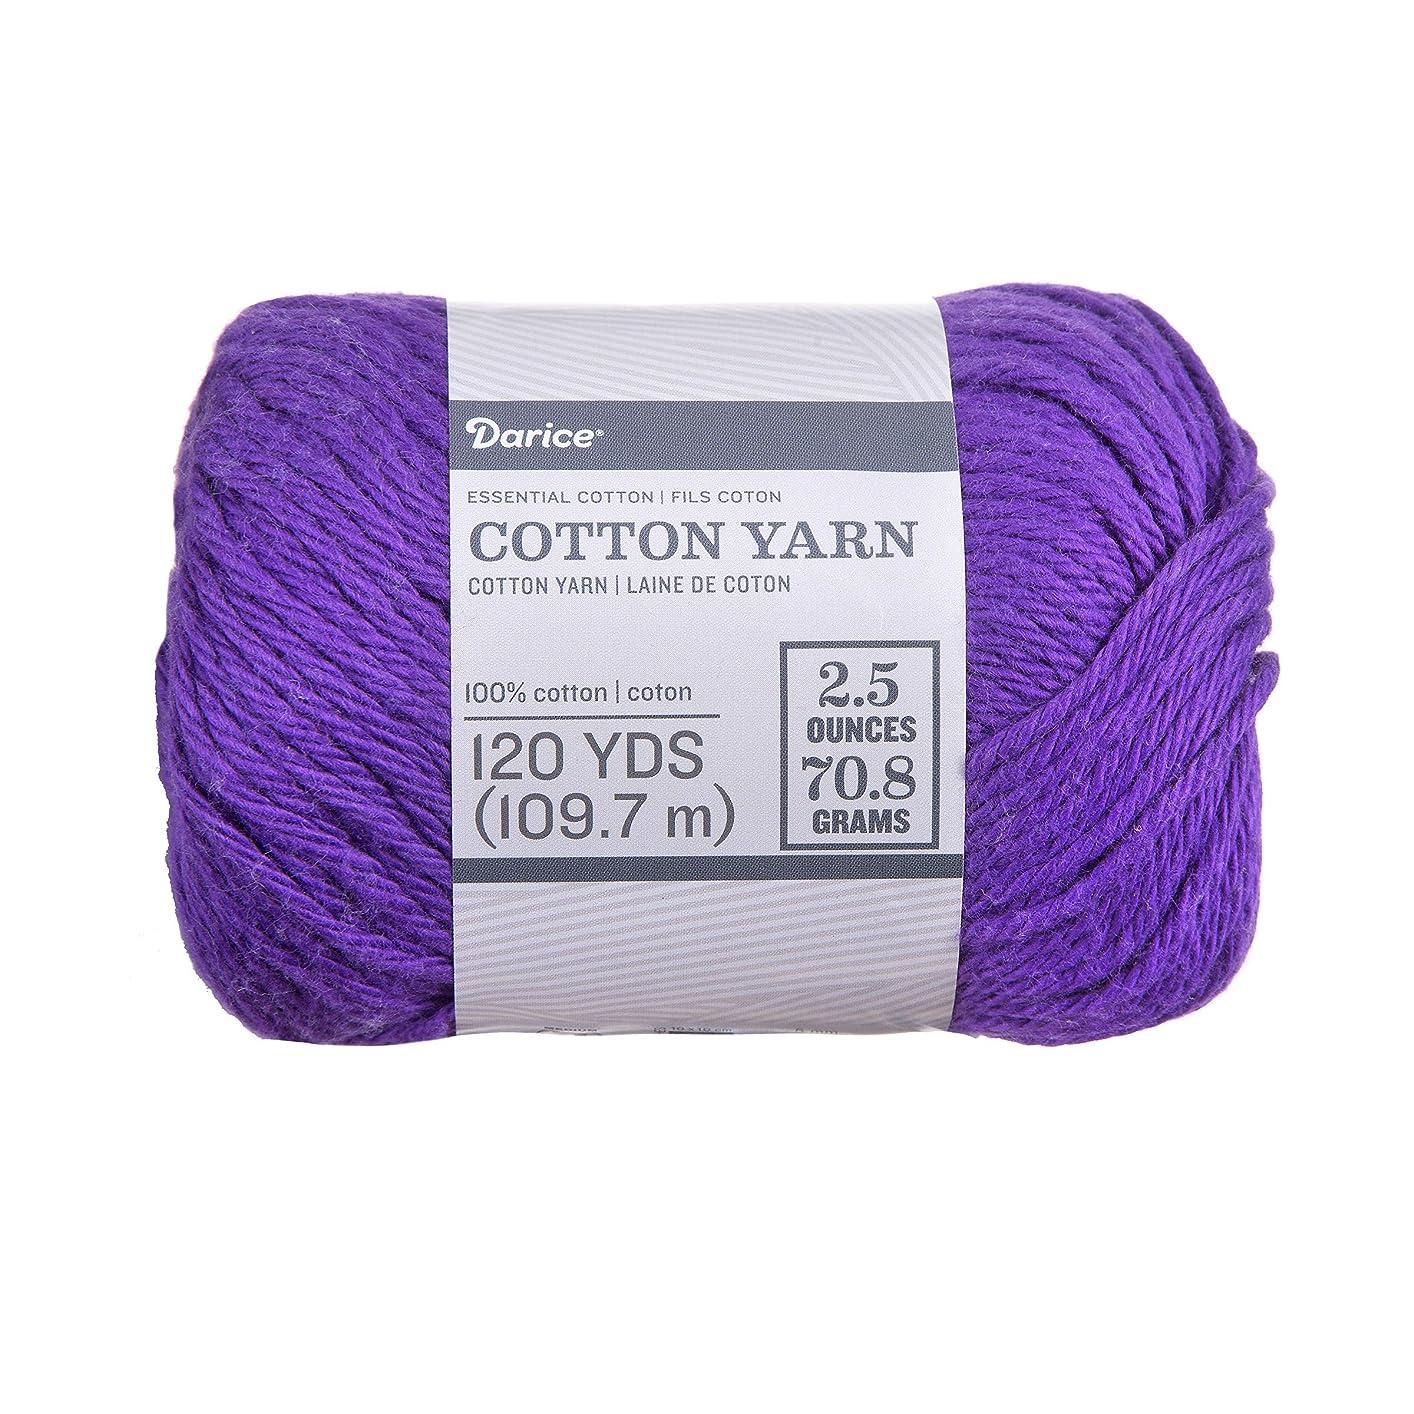 Darice 30072125 Essentials Cotton Yarn: Solid Purple, 2.5 Ounces